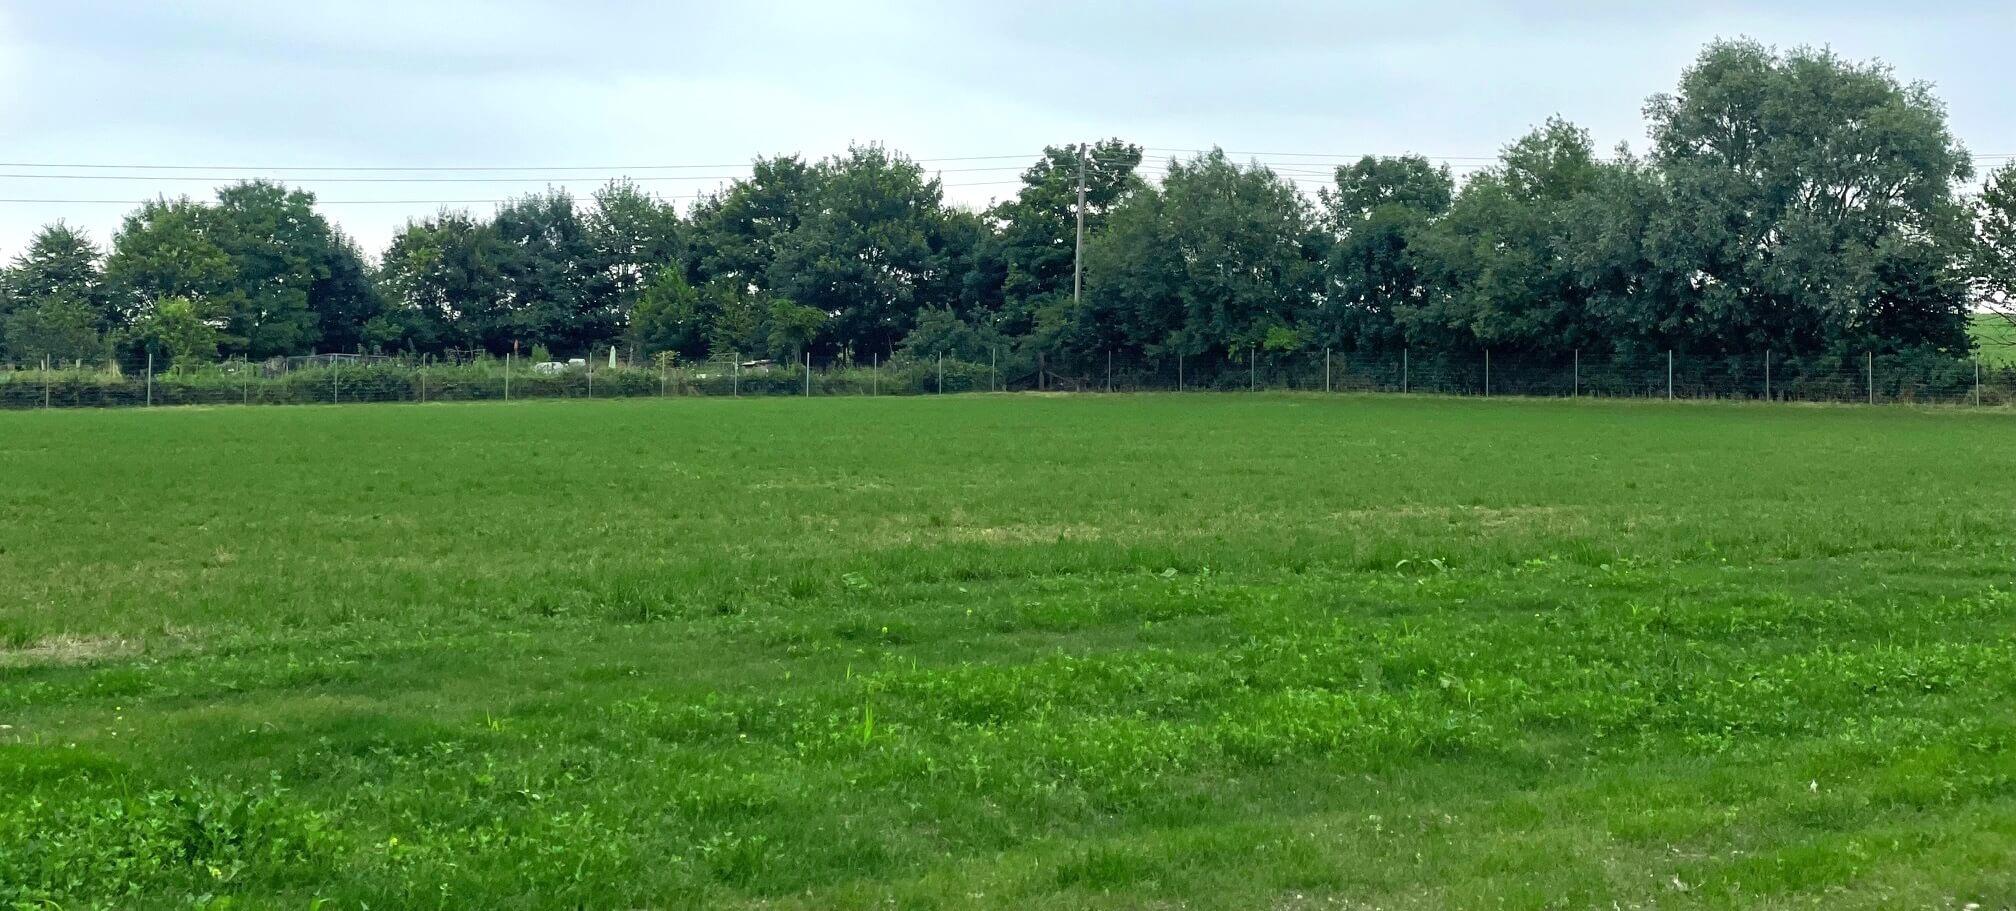 Blewbury Dog Park: Secure dog walking field close to Didcot, Wallingford, Wantage & Abingdon